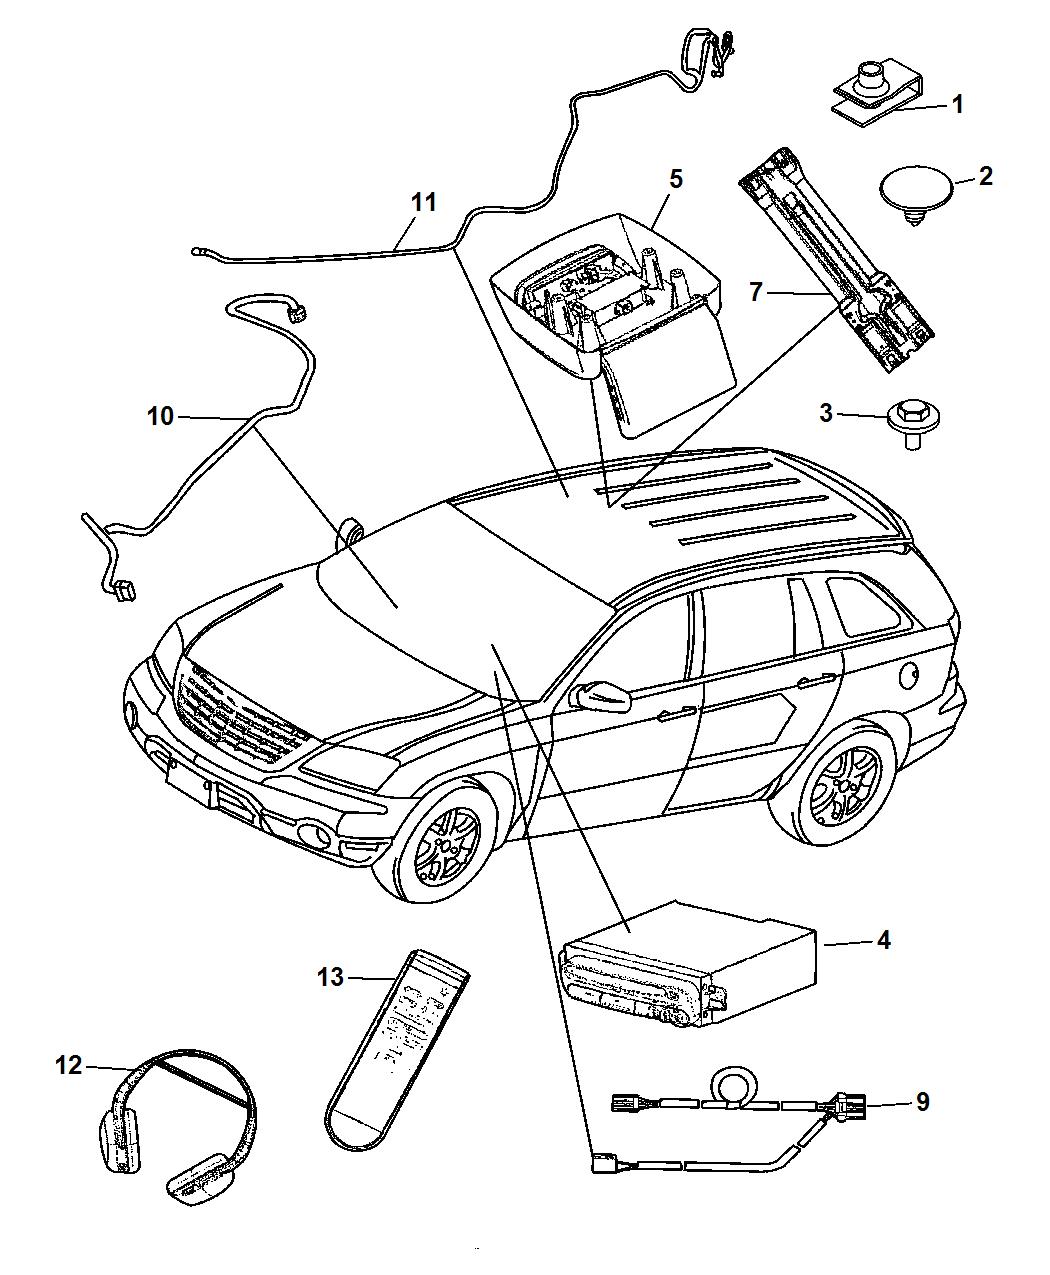 wiring diagram for alternator 1997 dodge ram 3500 wiring diagram used 2012 dodge ram trailer wiring diagram 2012 ram wiring diagram